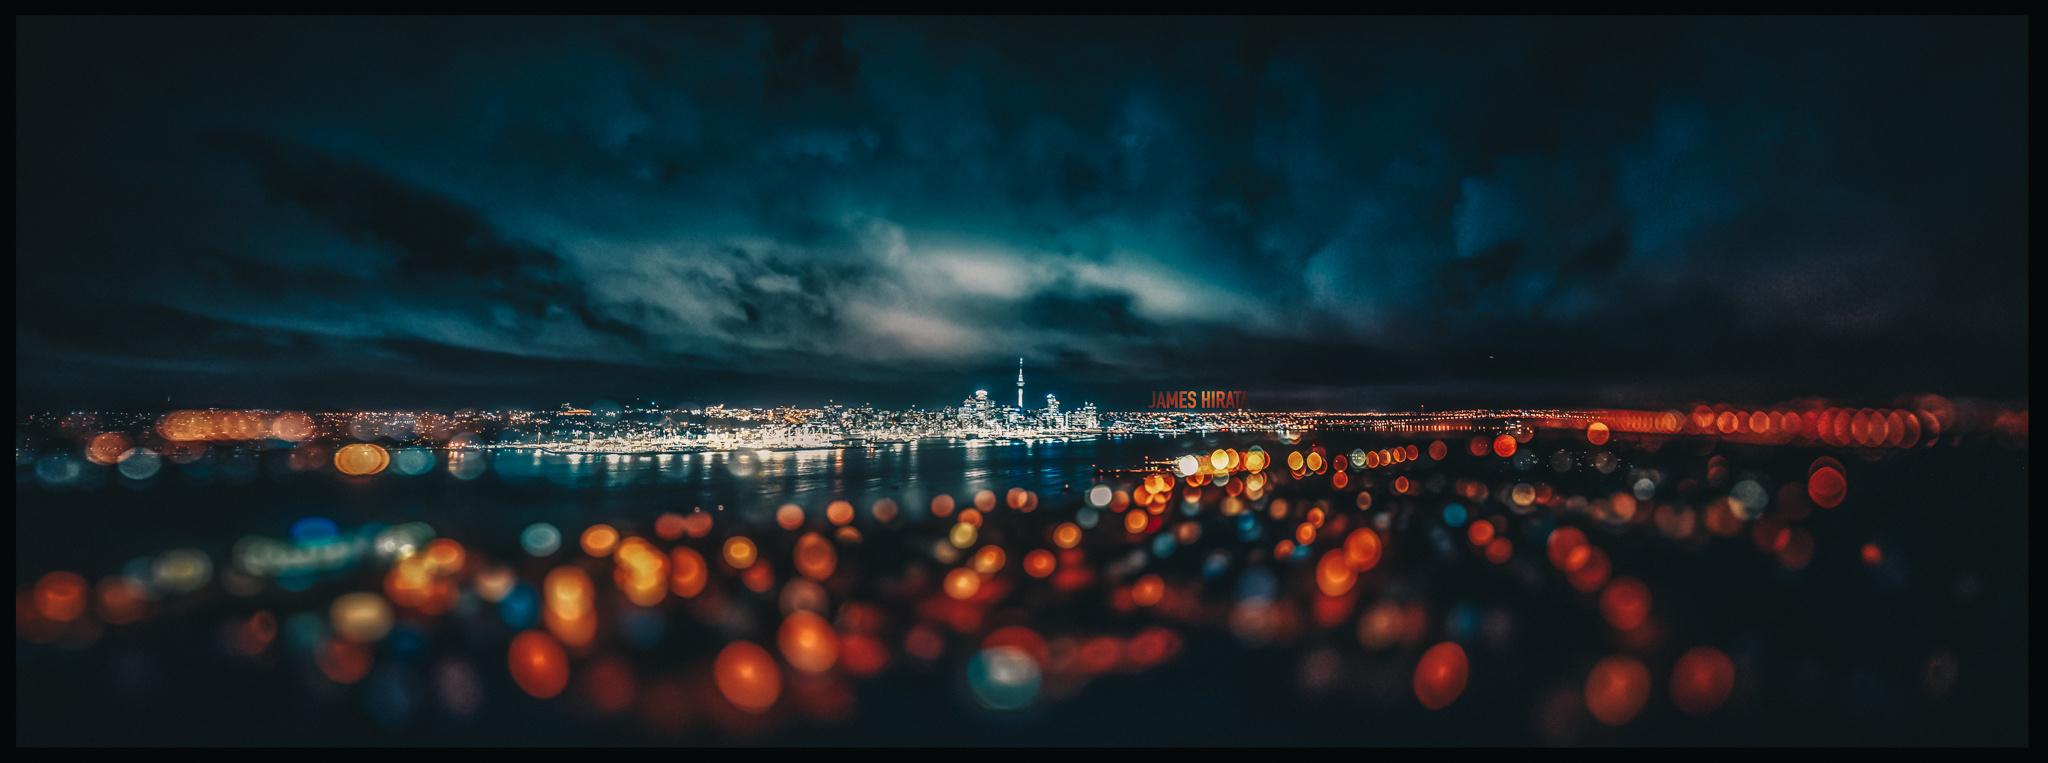 la diode  u00e9lectroluminescente diode la lumi u00e8re la nuit